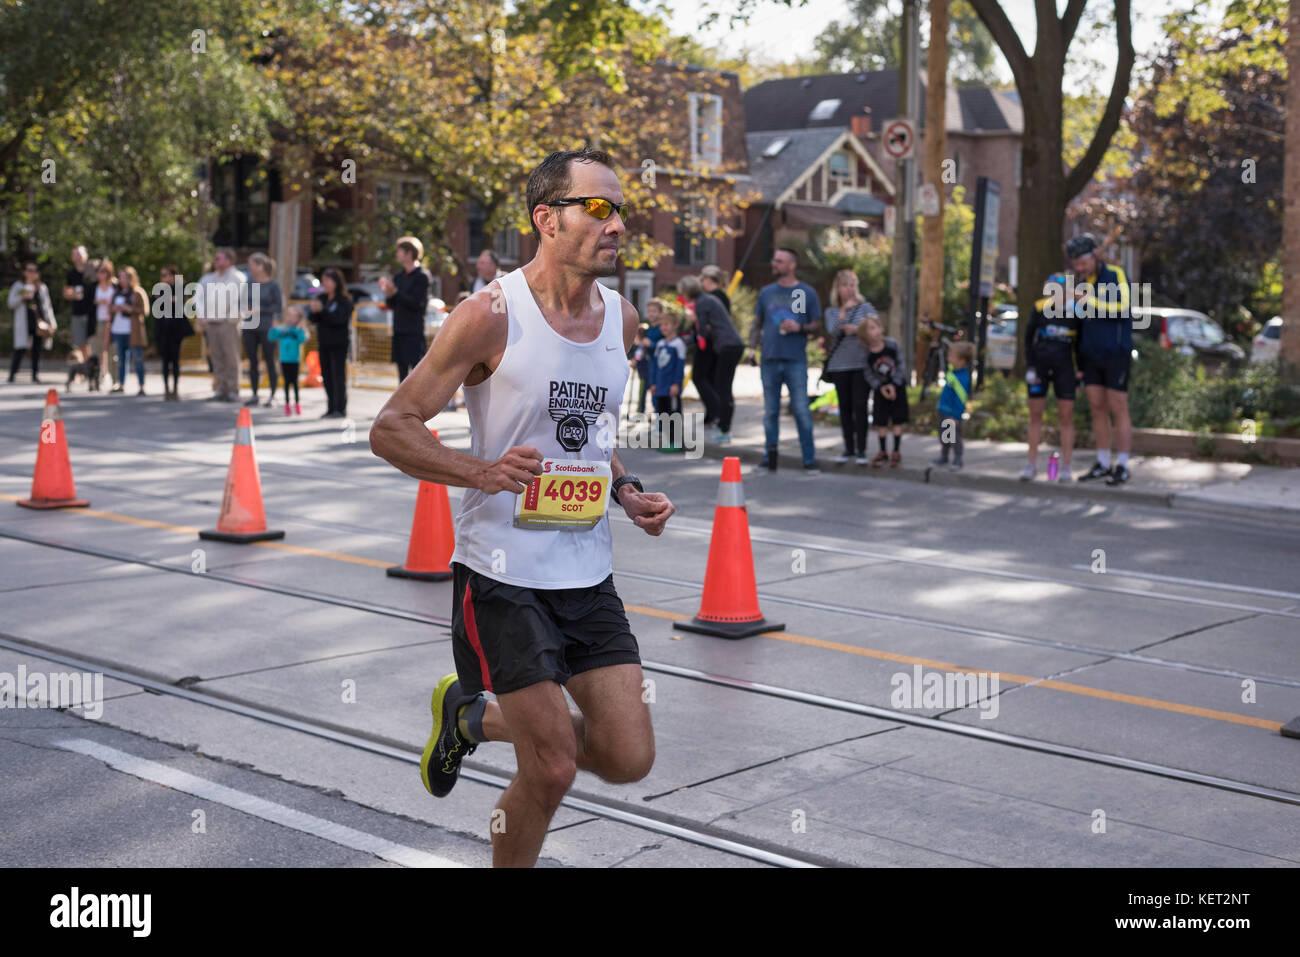 TORONTO, ON/CANADA - OCT 22, 2017: Marathon runner Scot passing the 33km turnaround point at the 2017 Scotiabank - Stock Image